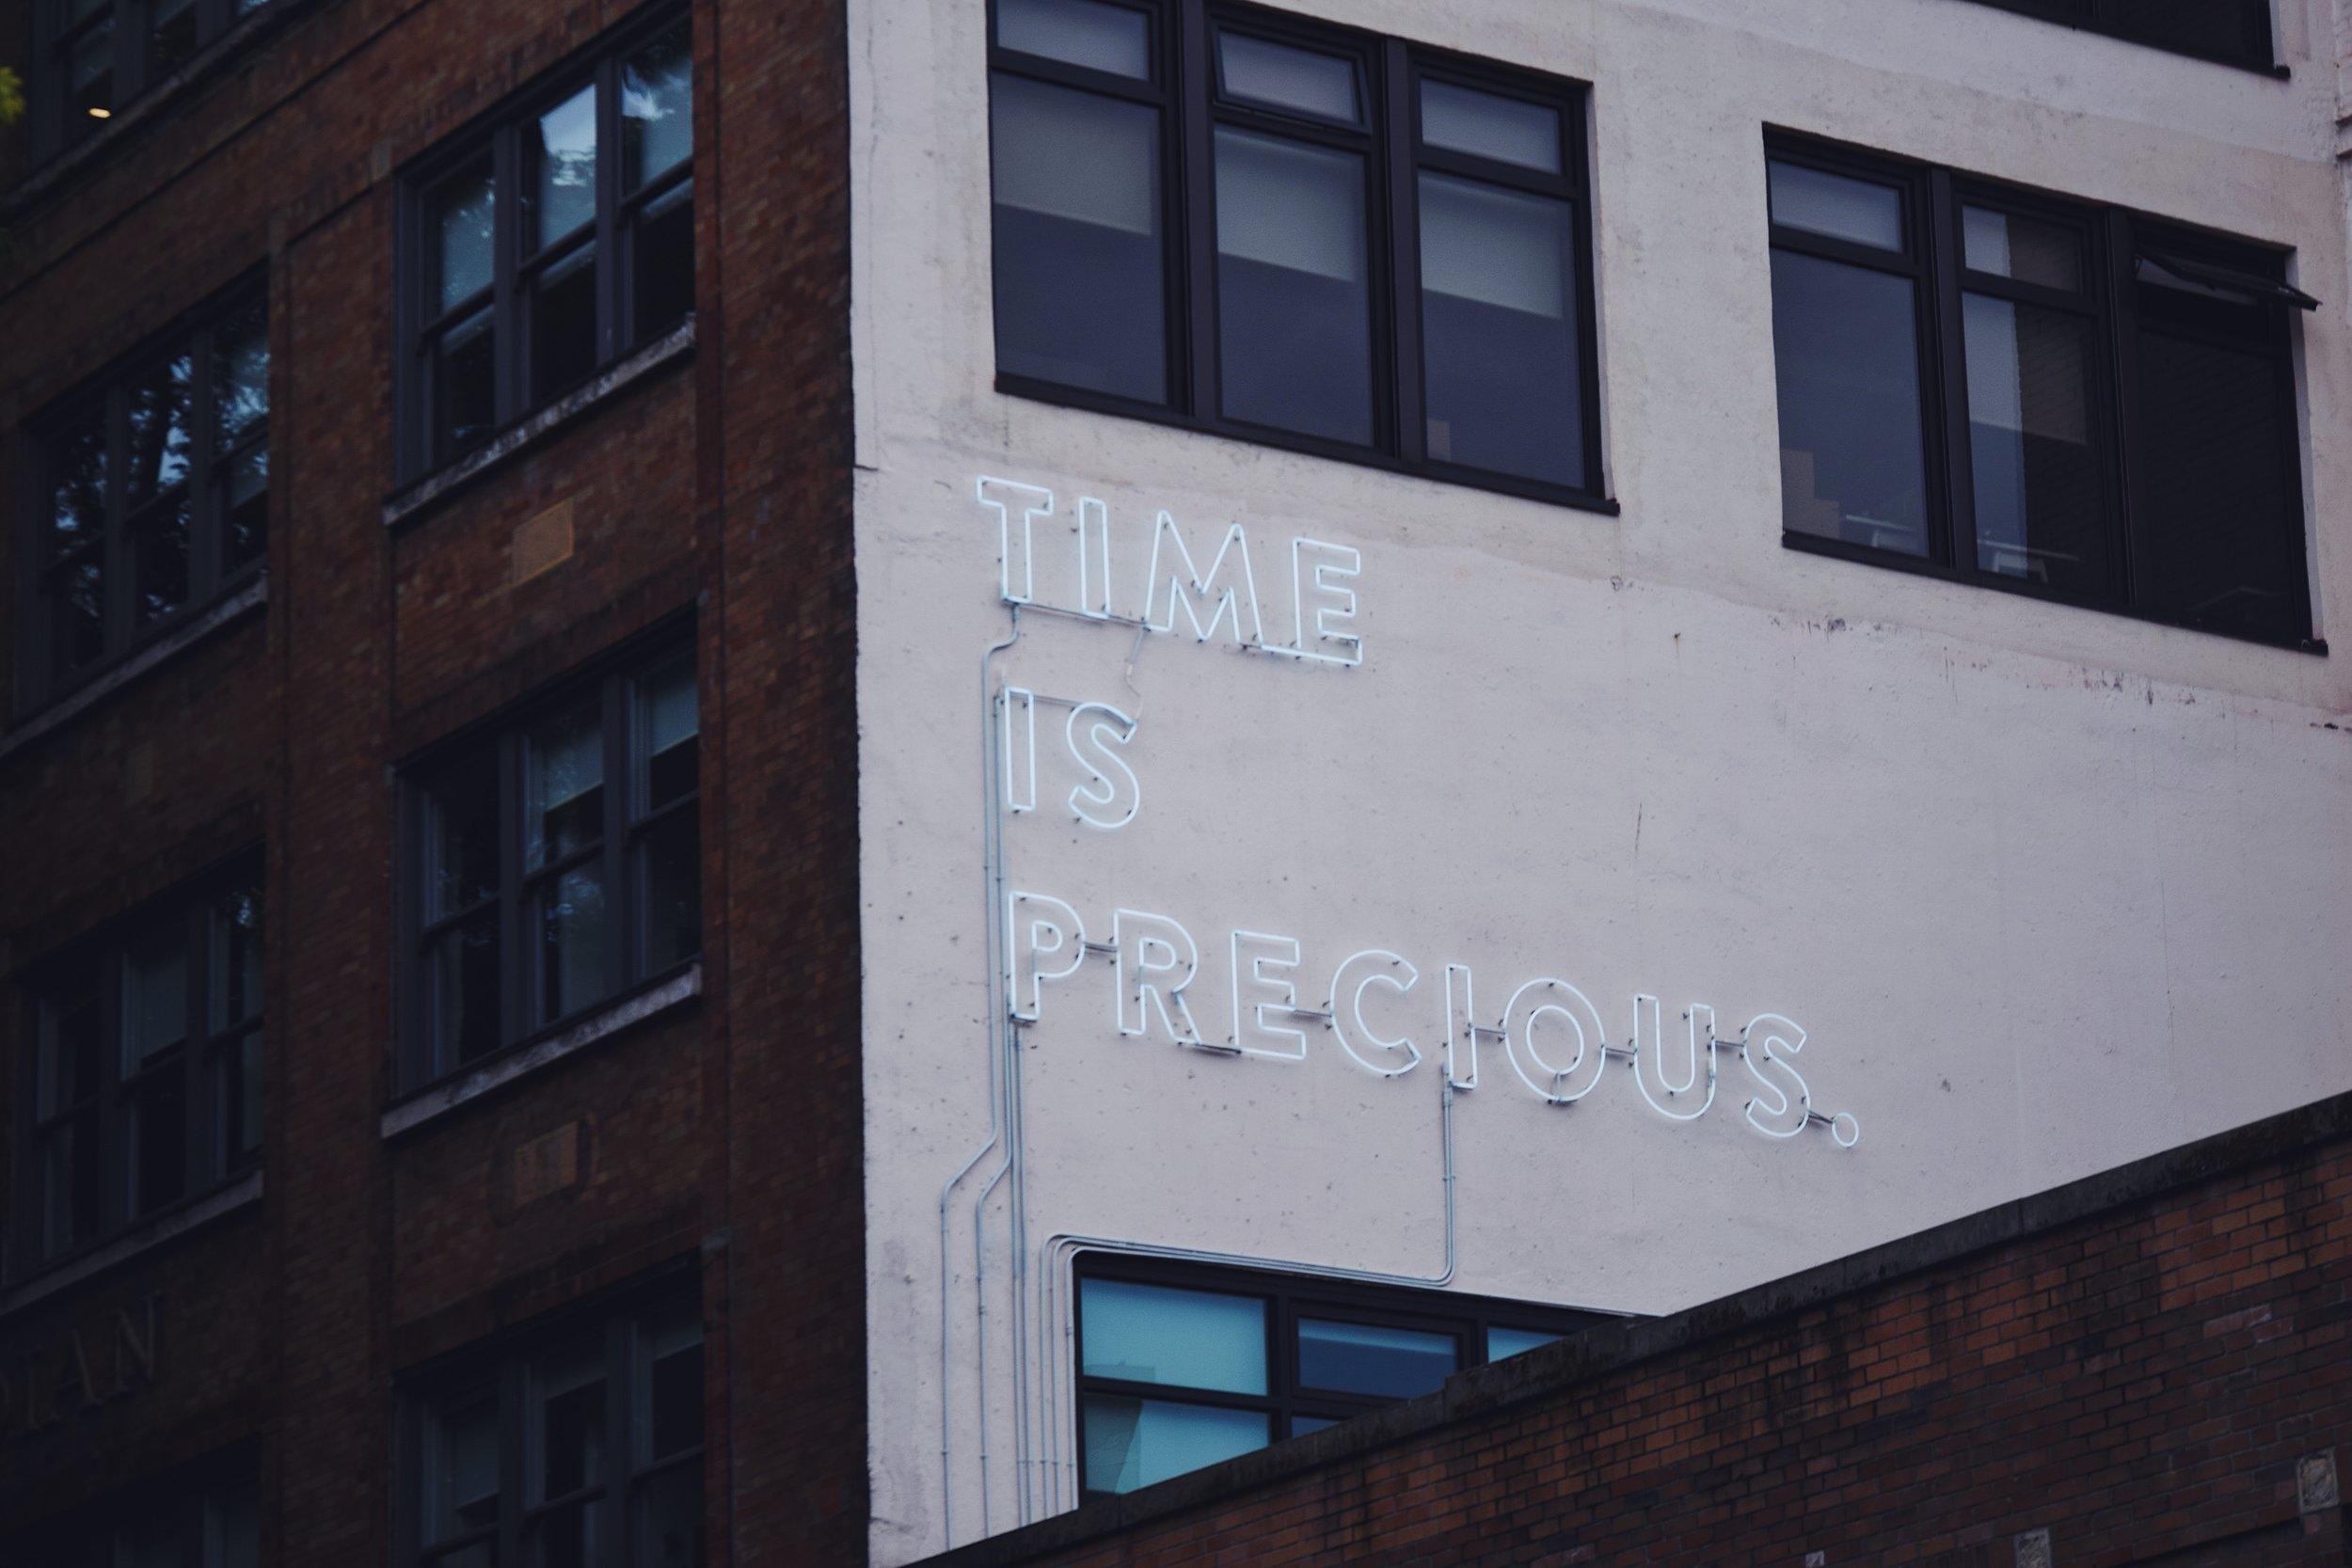 time is precious harry-sandhu-209807-unsplash.jpg